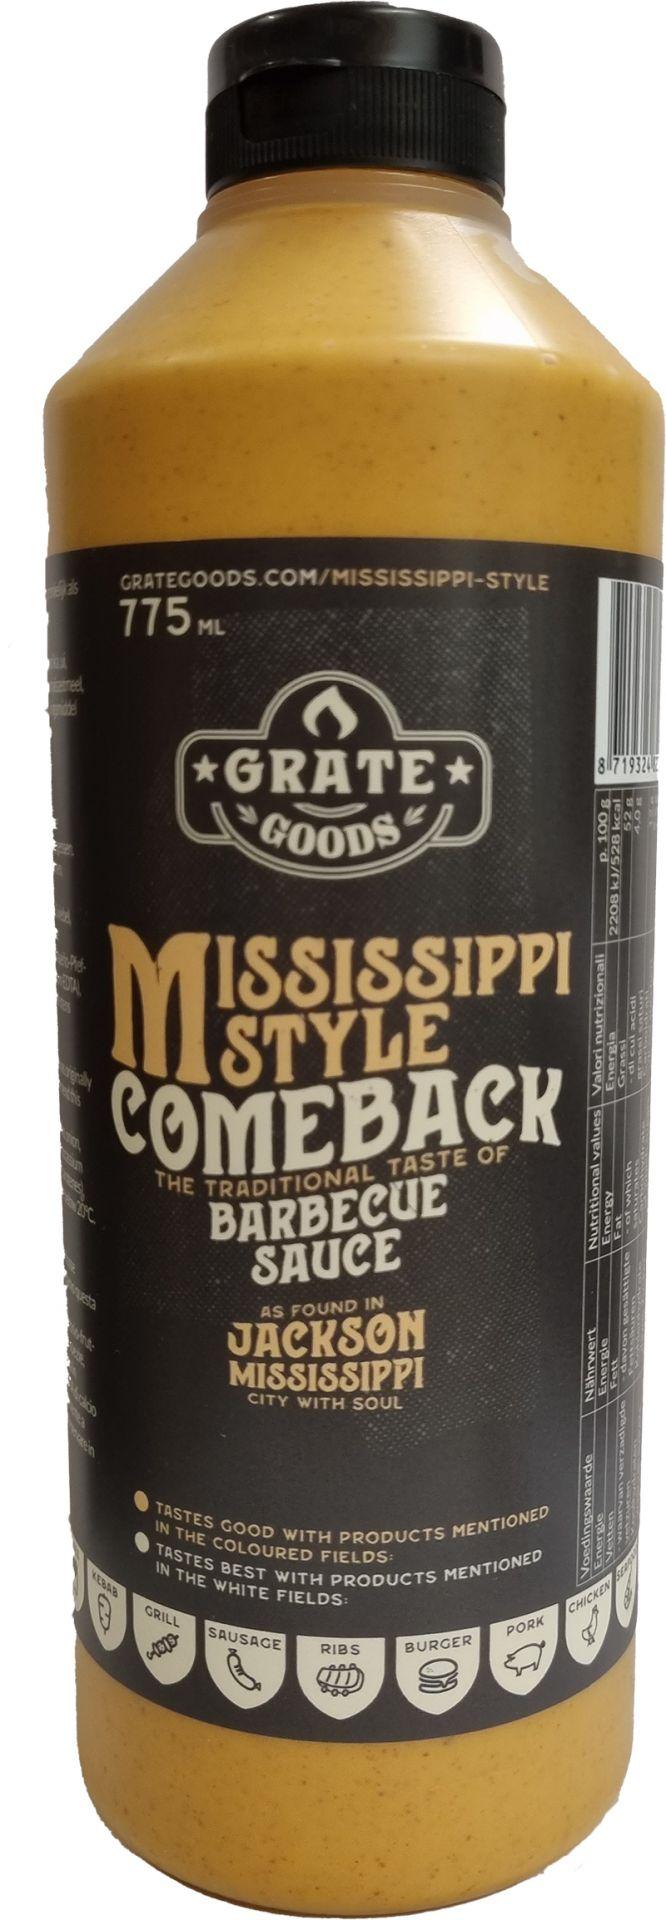 Grate Goods Mississippi Comeback BBQ Sauce 775ml